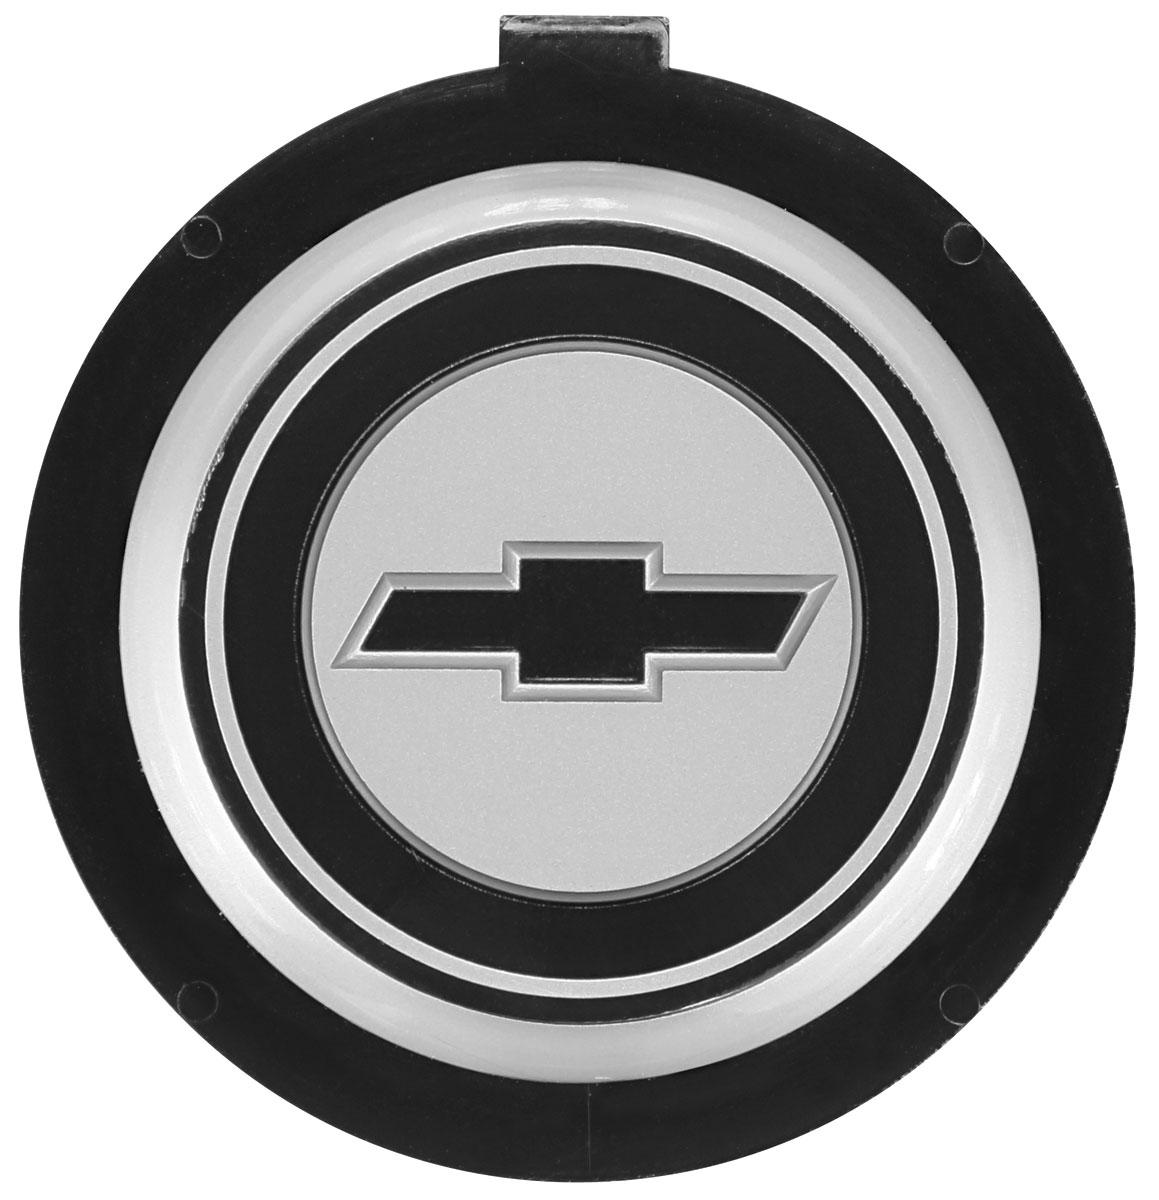 Emblem, Horn Button, Sport Steering Wheel, 1971-77 CH/EC/MC, White